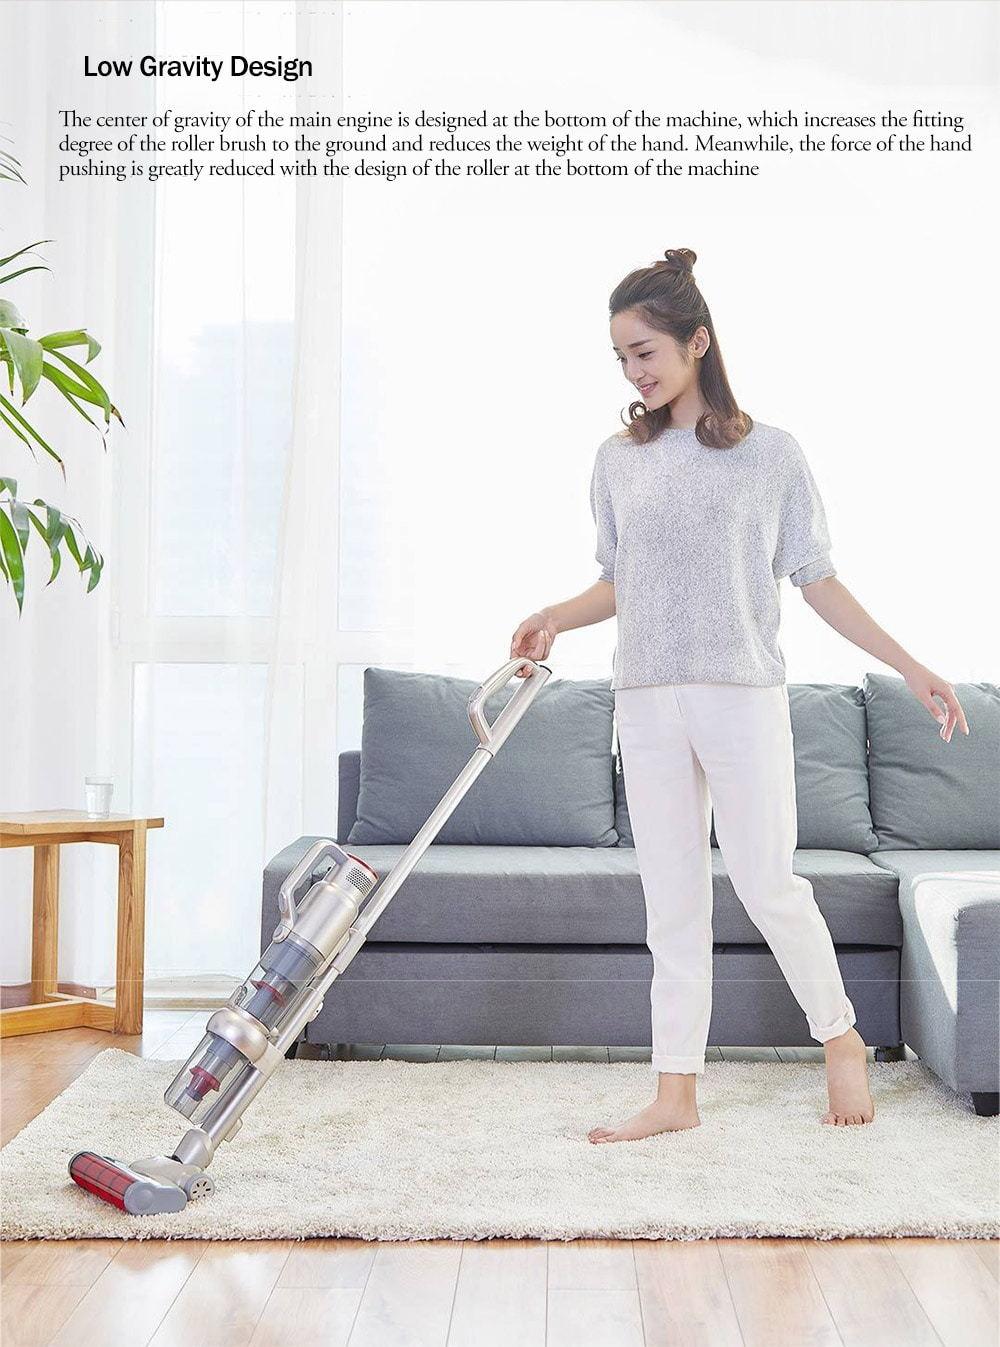 lexy jimmy jv71 vacuum cleaner